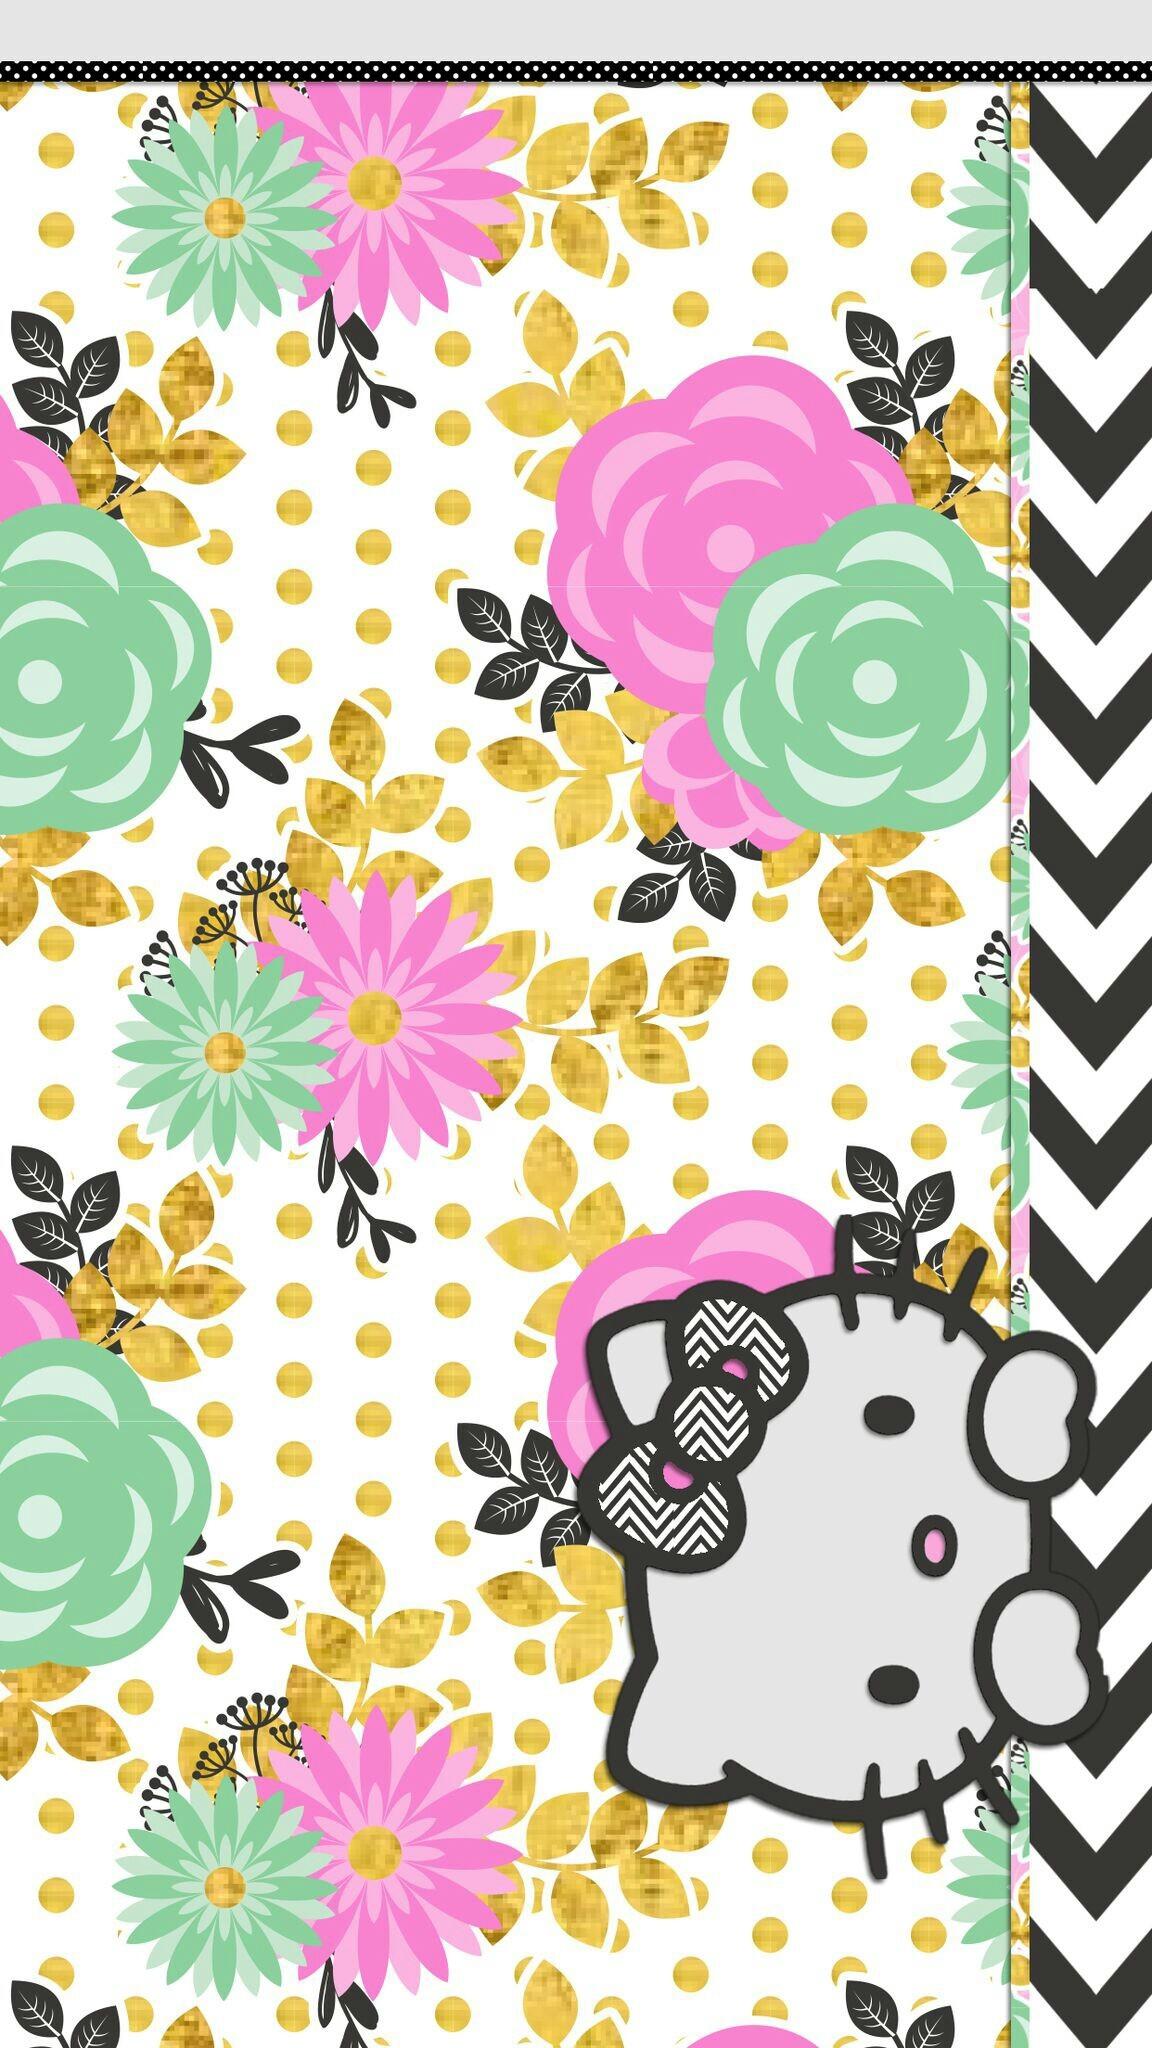 Hello Kitty Wallpaper for Desktop (62+ pictures)